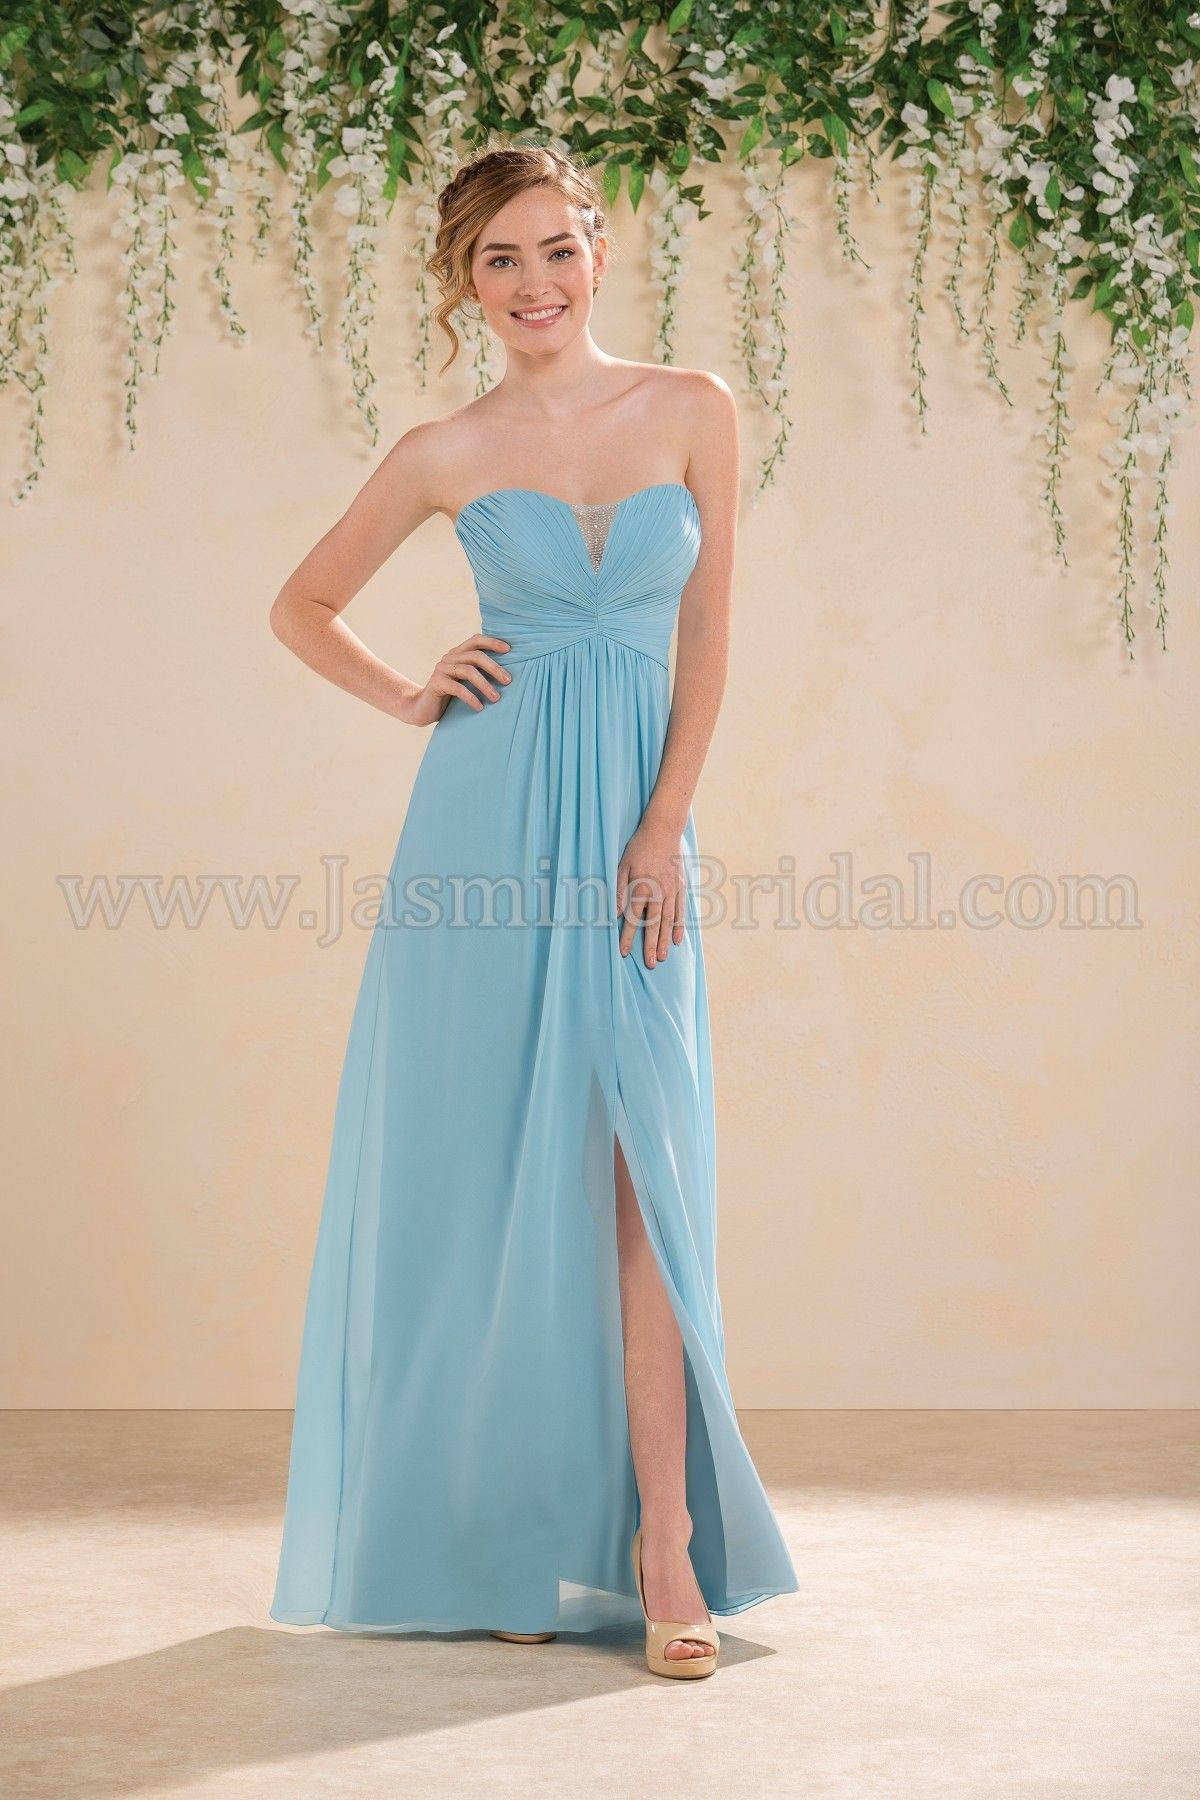 Jasmine Bridal Bridesmaid Dress B2 Style B183009 in Tahiti, Blue ...